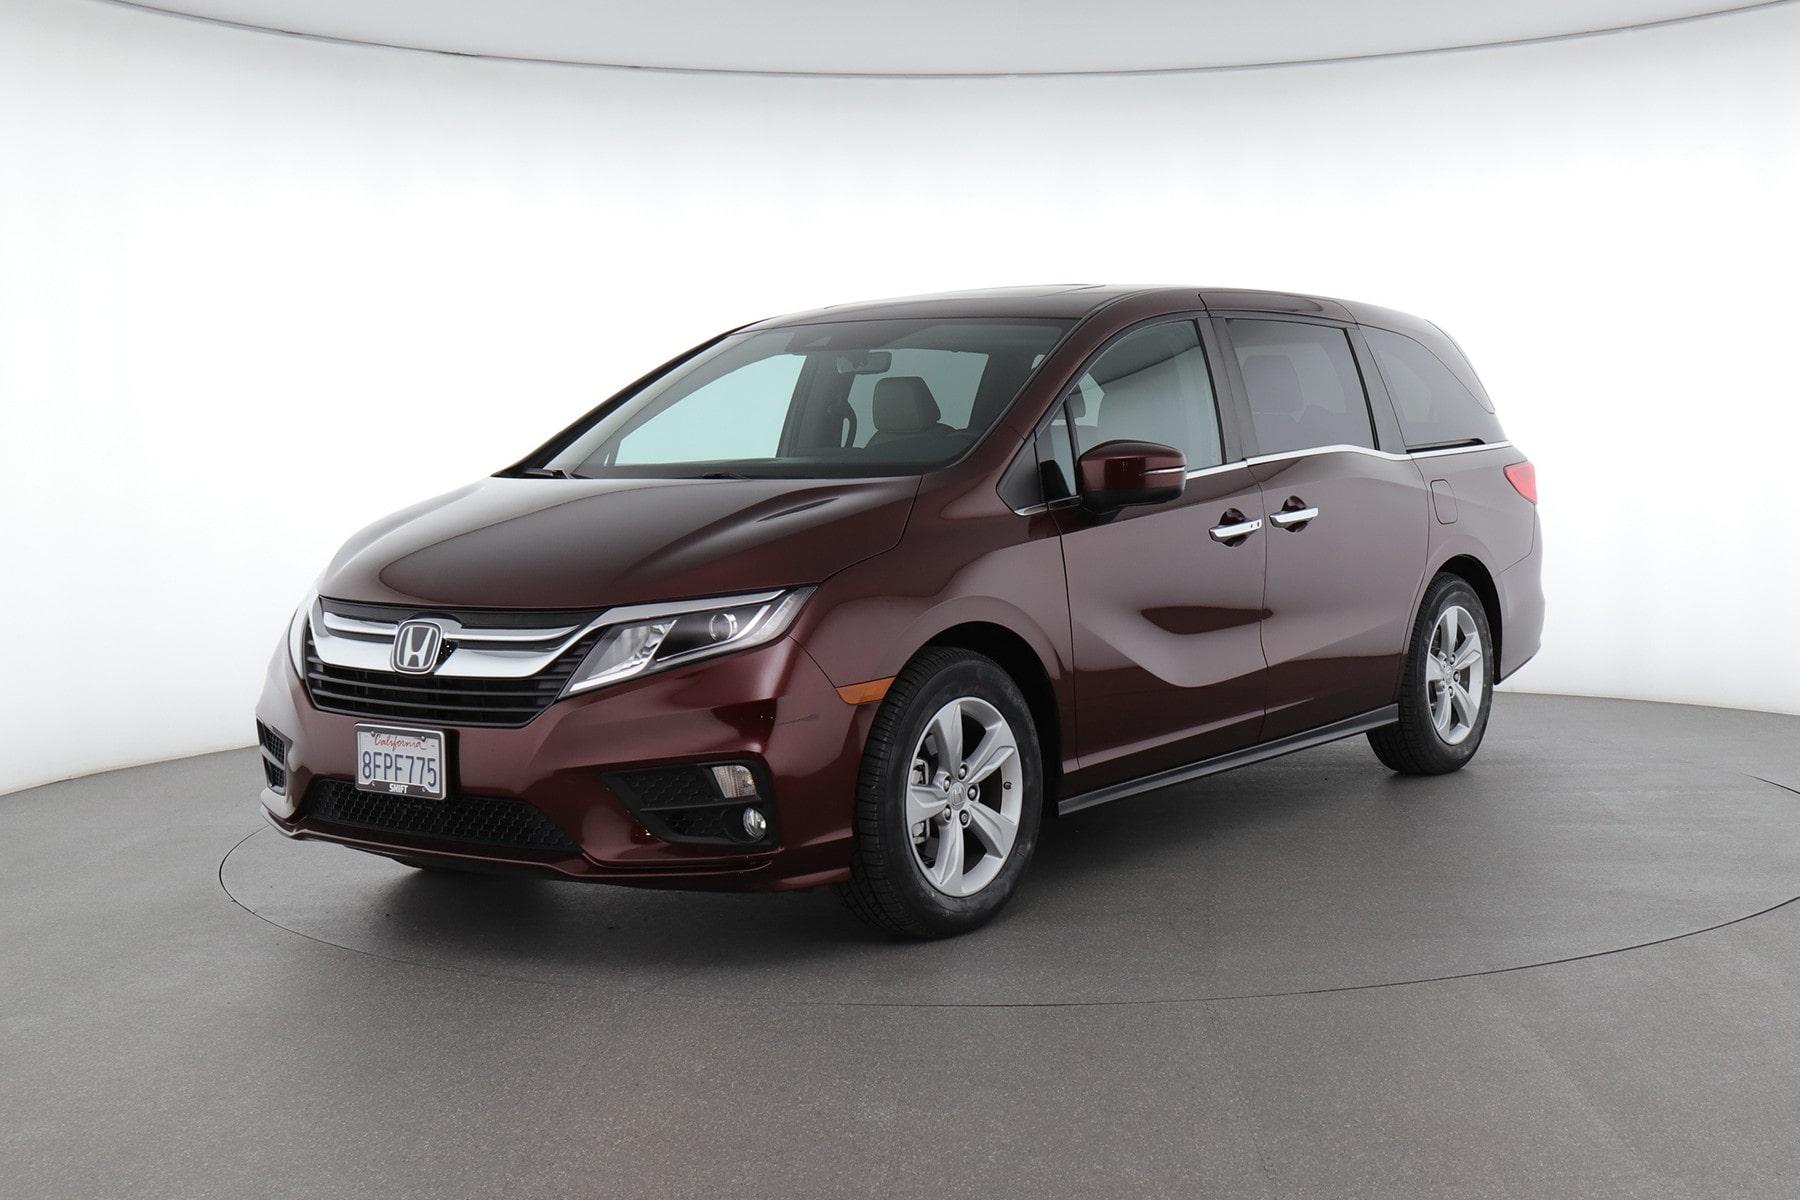 2018 Honda Odyssey EX-L (from $31,300)